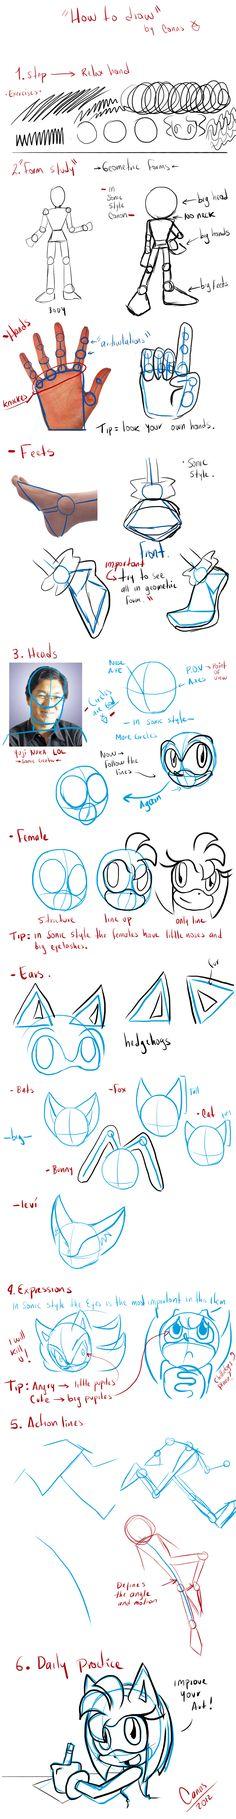 notHow to Draw Sonic's Body2? by DawnHedgehog555 on DeviantArt